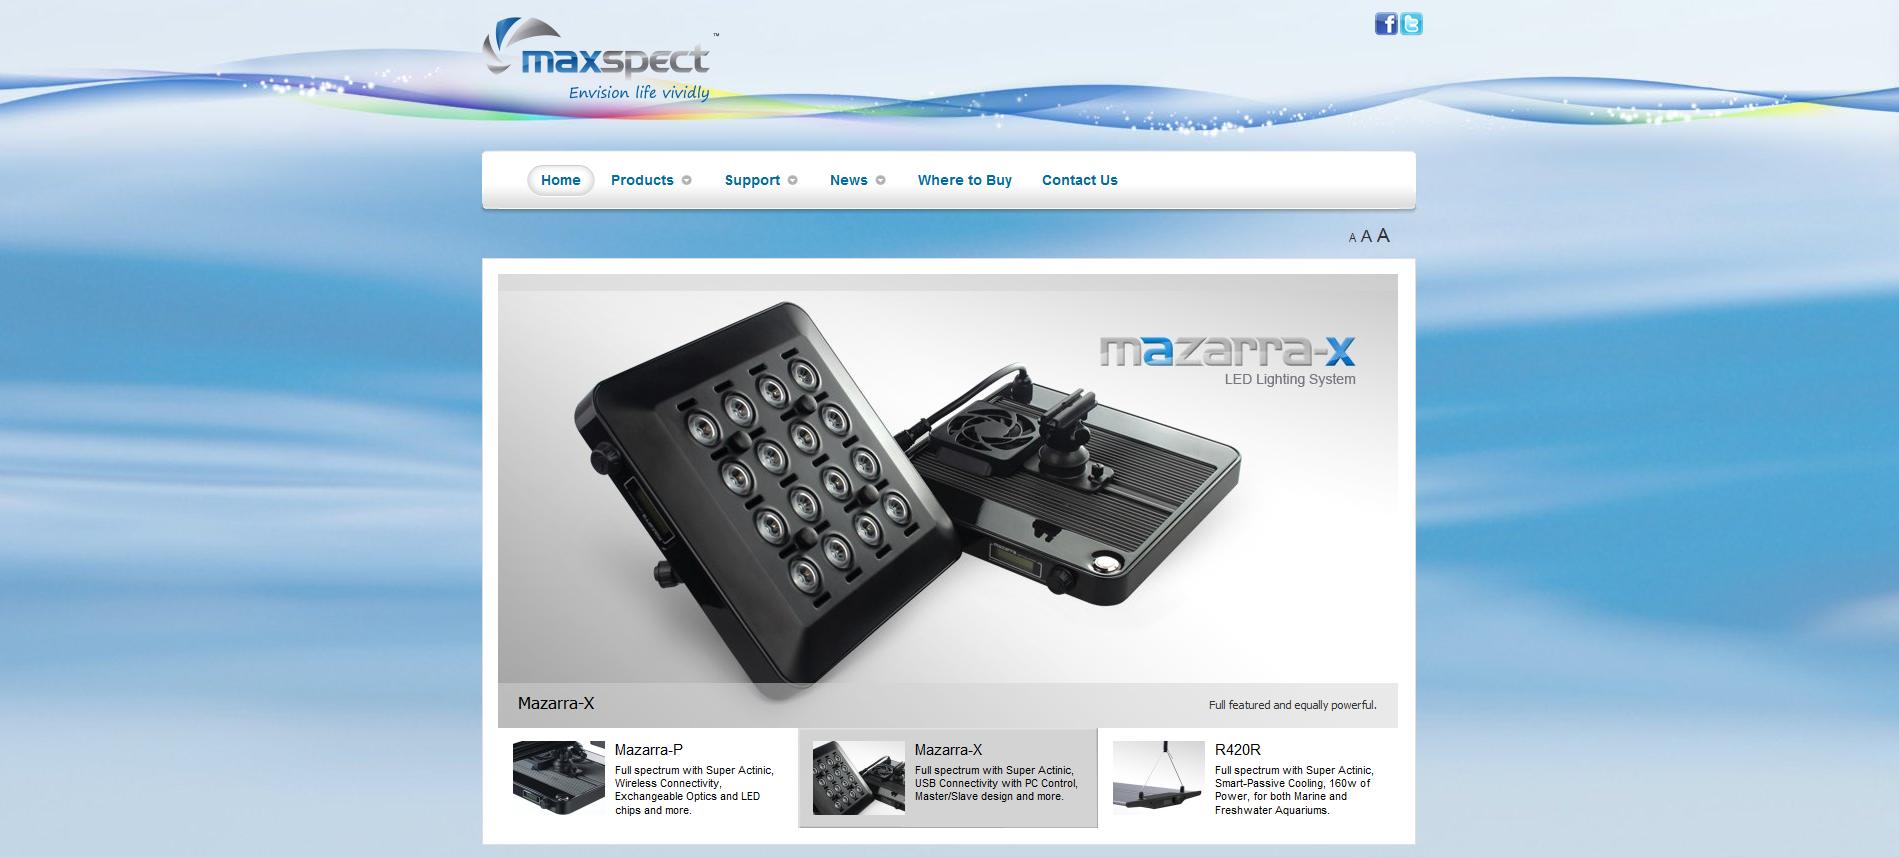 The New Maxspect USA Website